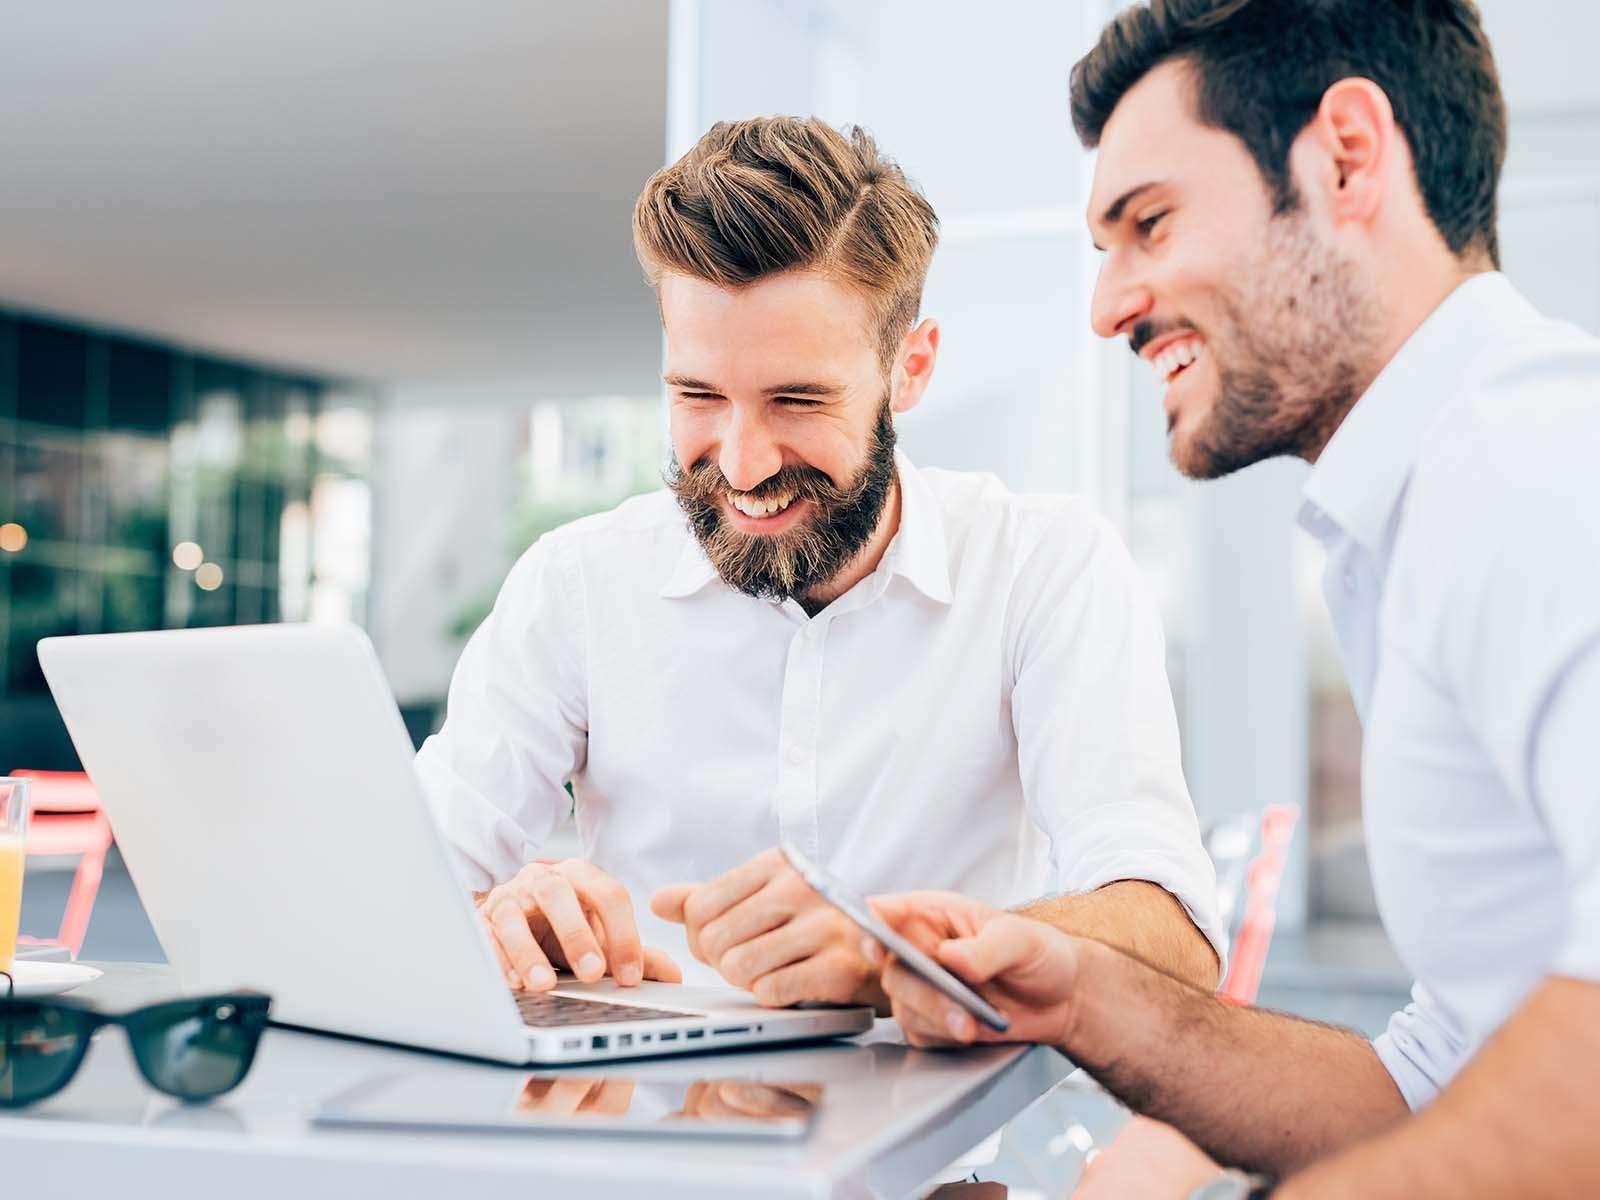 Customer Centric: Organiza tu negocio alrededor de tu cliente